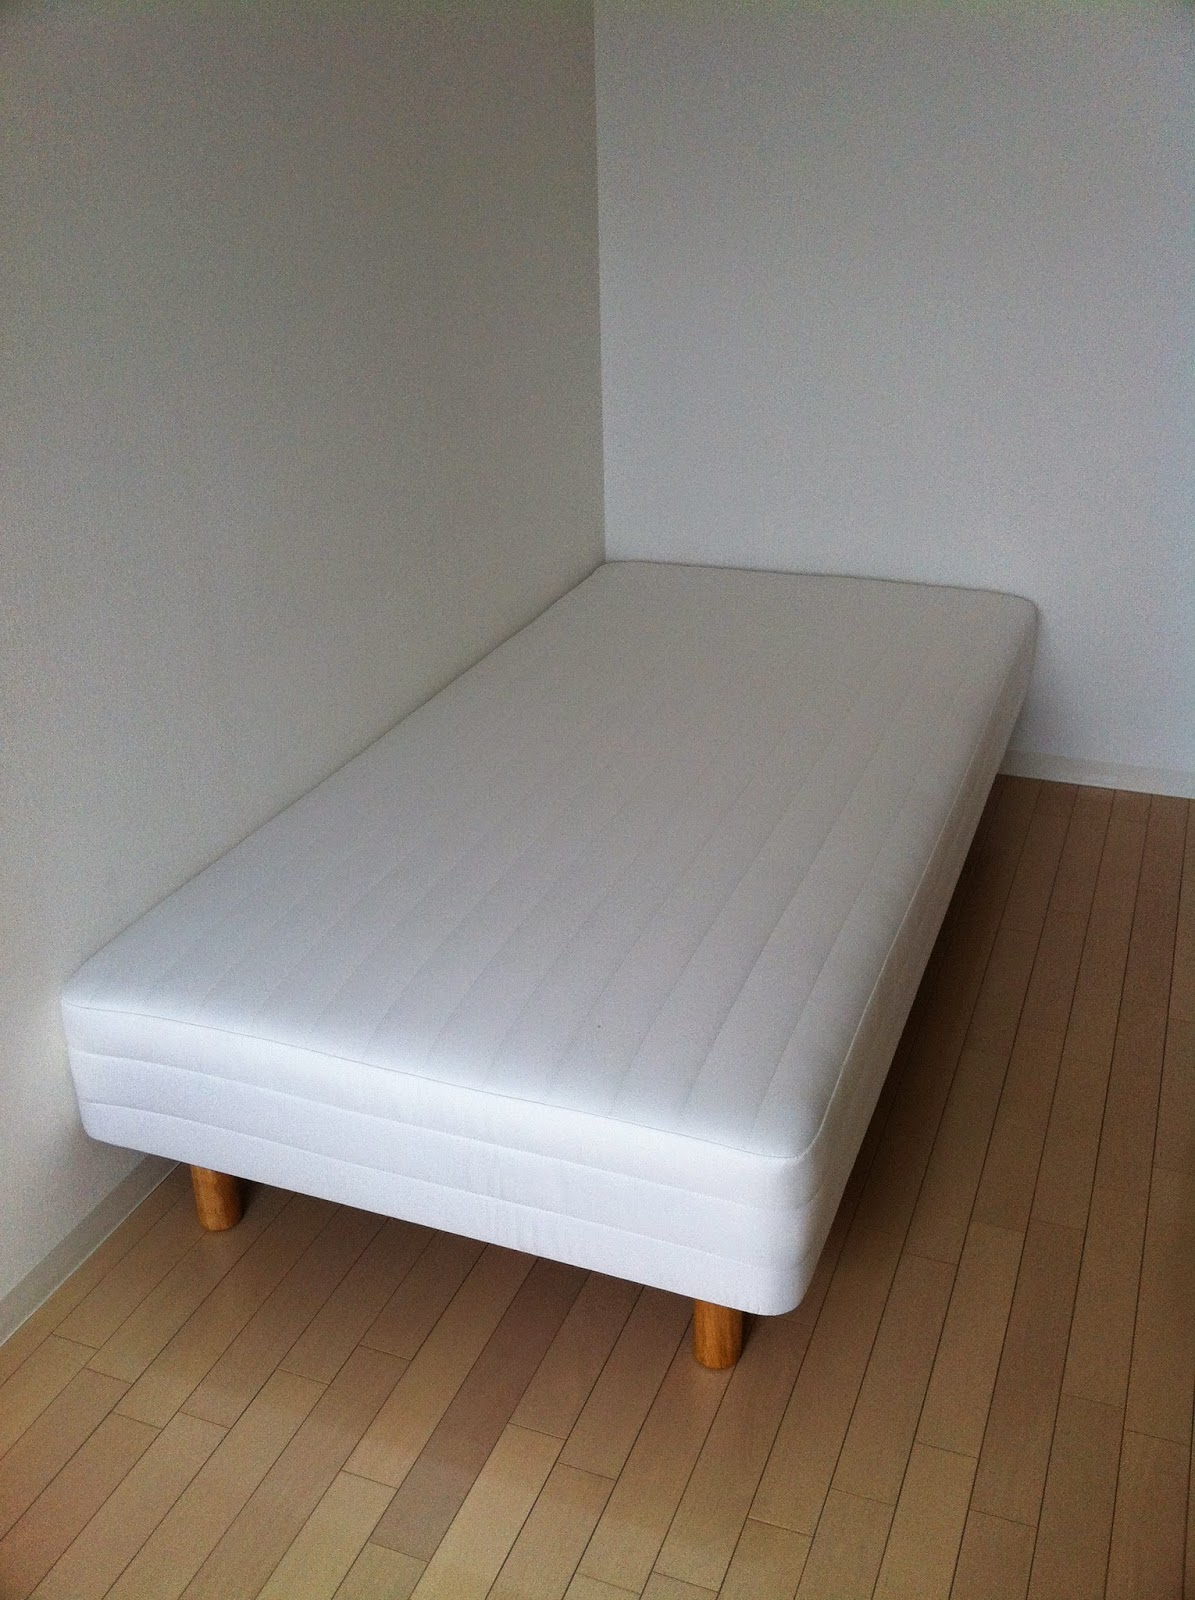 muji futon | Furniture Shop